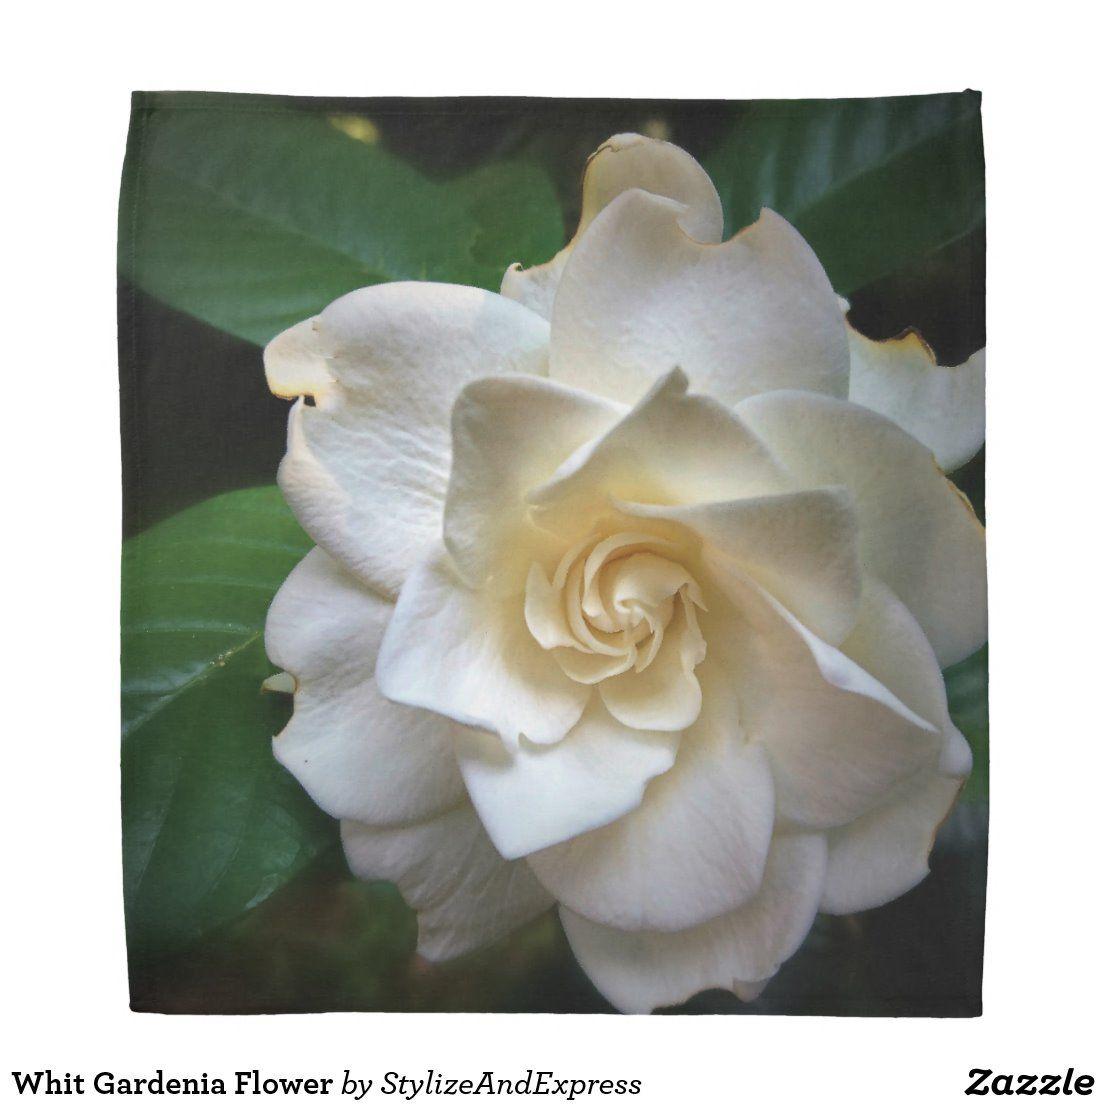 Whit Gardenia Flower Bandana Zazzle Com White Gardenia